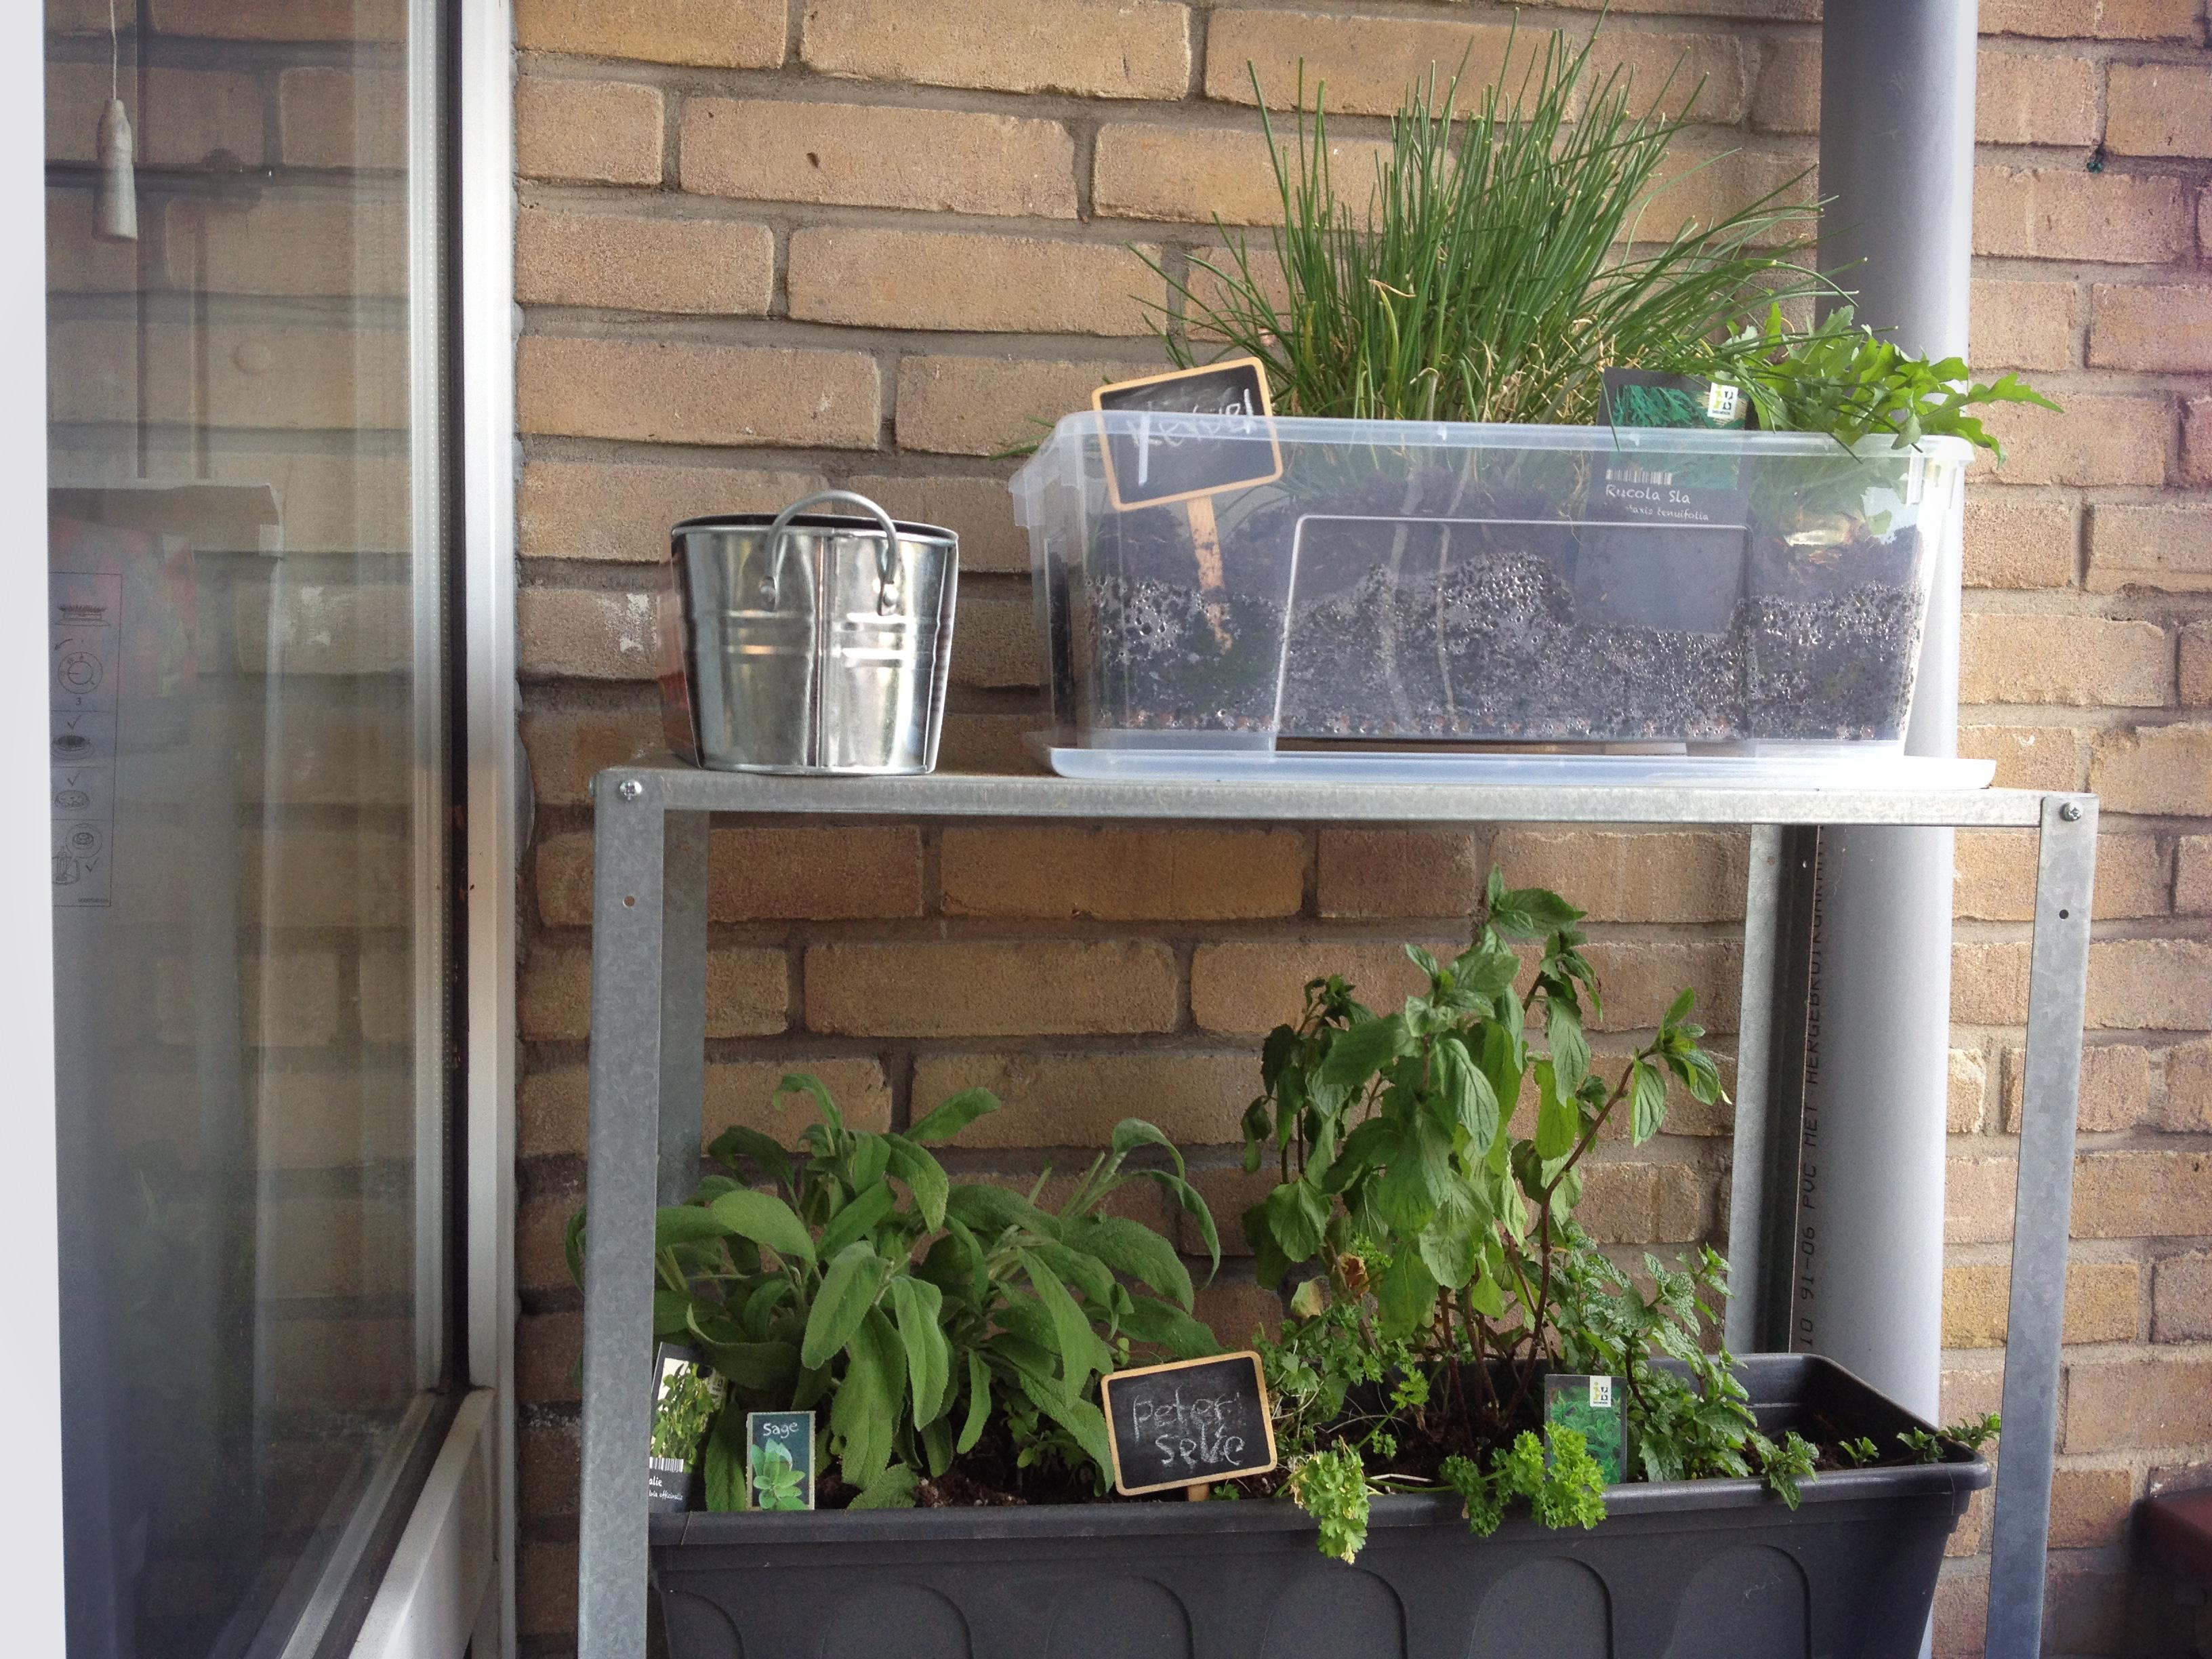 Kast Voor Balkon : Balkon in klein appartement. stunning klein appartement van m met